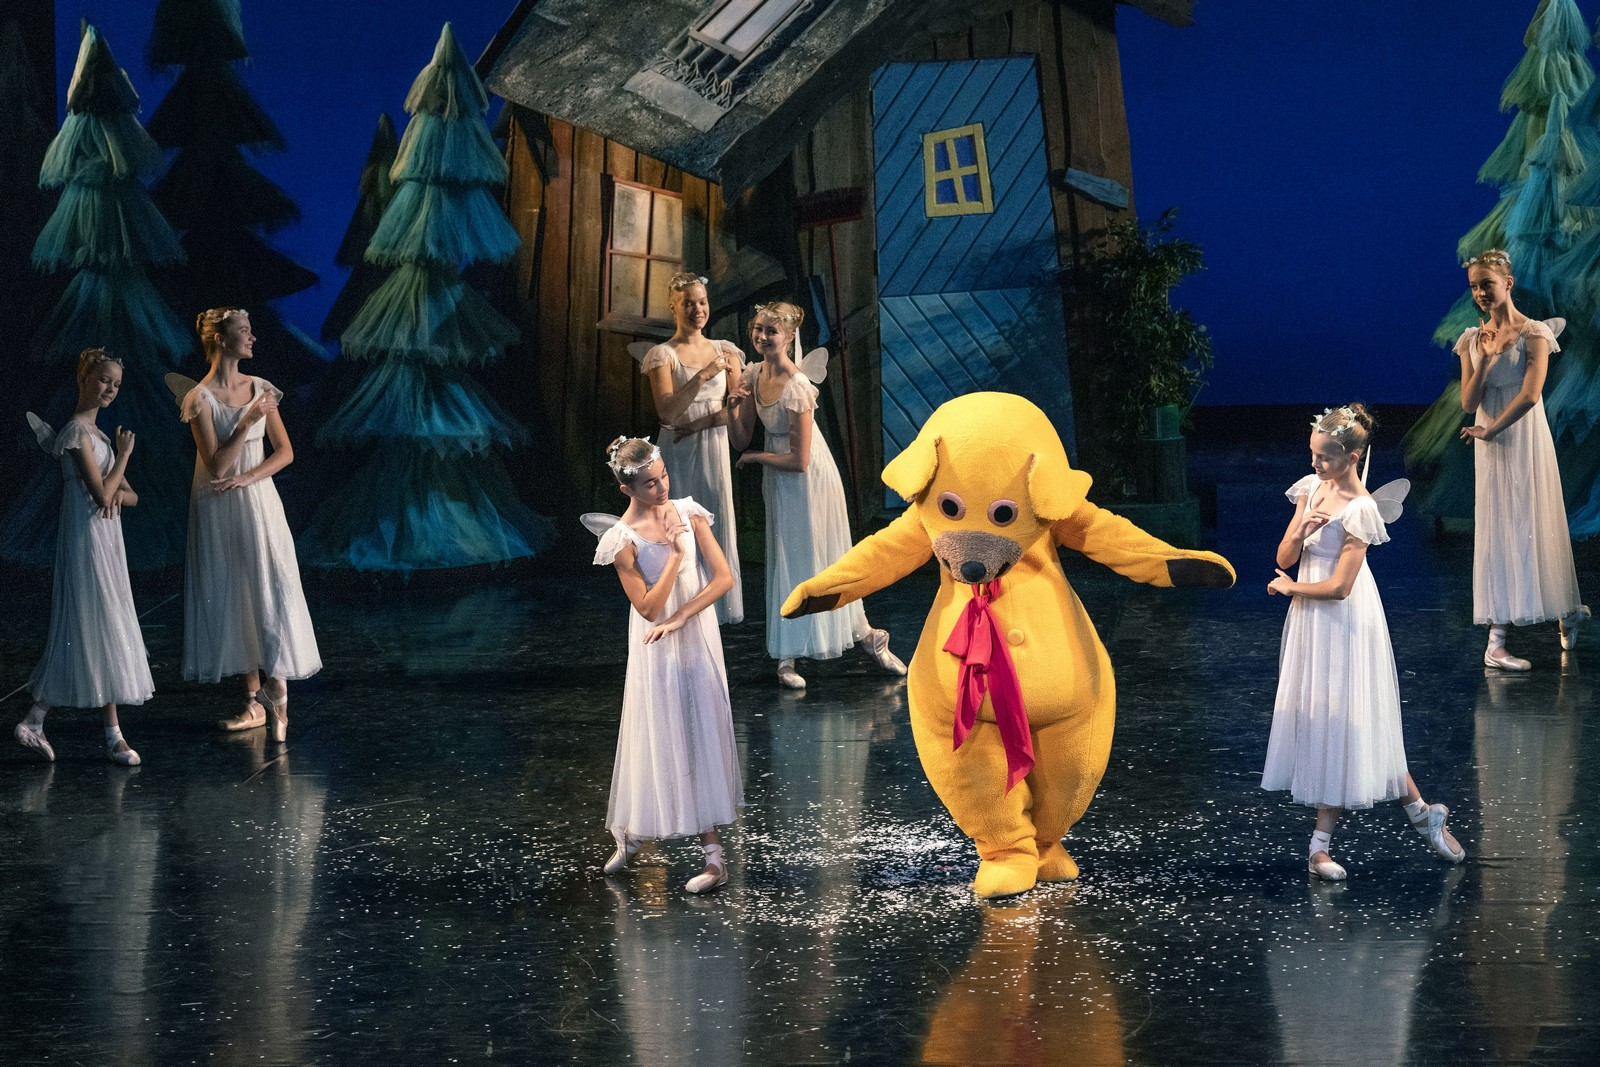 Anmeldelse: Kom Bamse, nu balletter vi!, Det Kongelige Teater